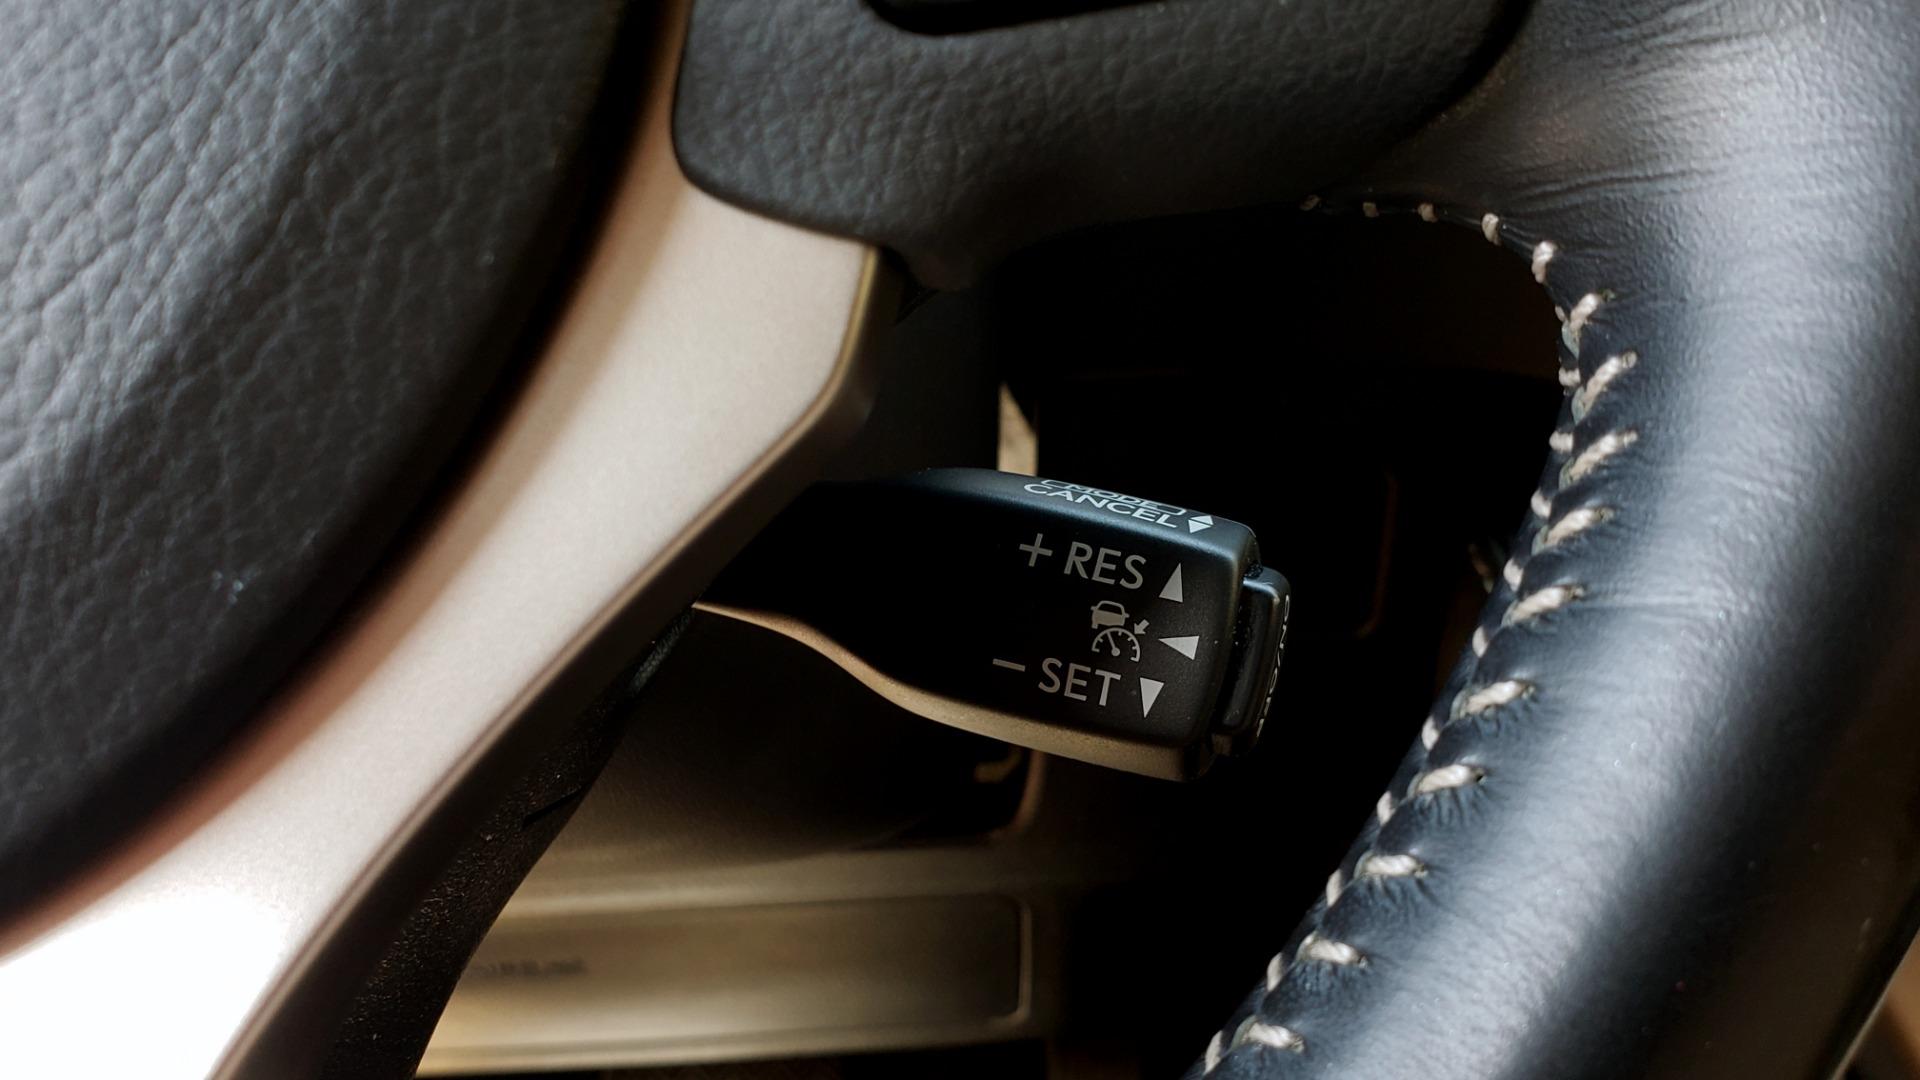 Used 2016 Lexus NX 200T PREM PKG / NAV / SUNROOF / PRE-COLLISION / PARK ASST for sale Sold at Formula Imports in Charlotte NC 28227 41